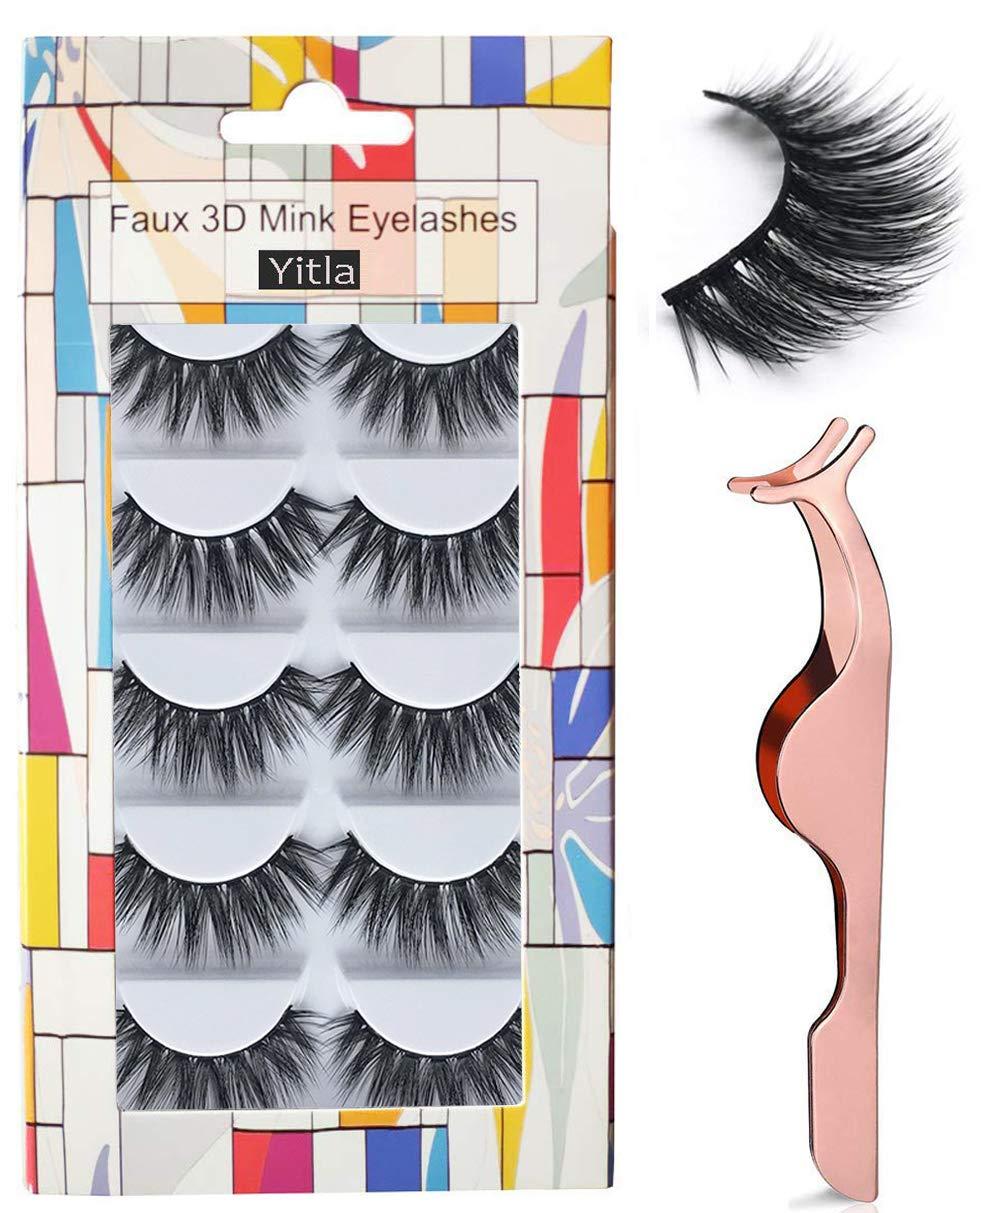 b363af154c5 Professional 5 Pack Faux 3D Mink Eyelashes Thick Long Multilayer Fluffy False  Eyelashes With Free Precision Eyelashes Clip (5 pairs): Amazon.co.uk: Beauty